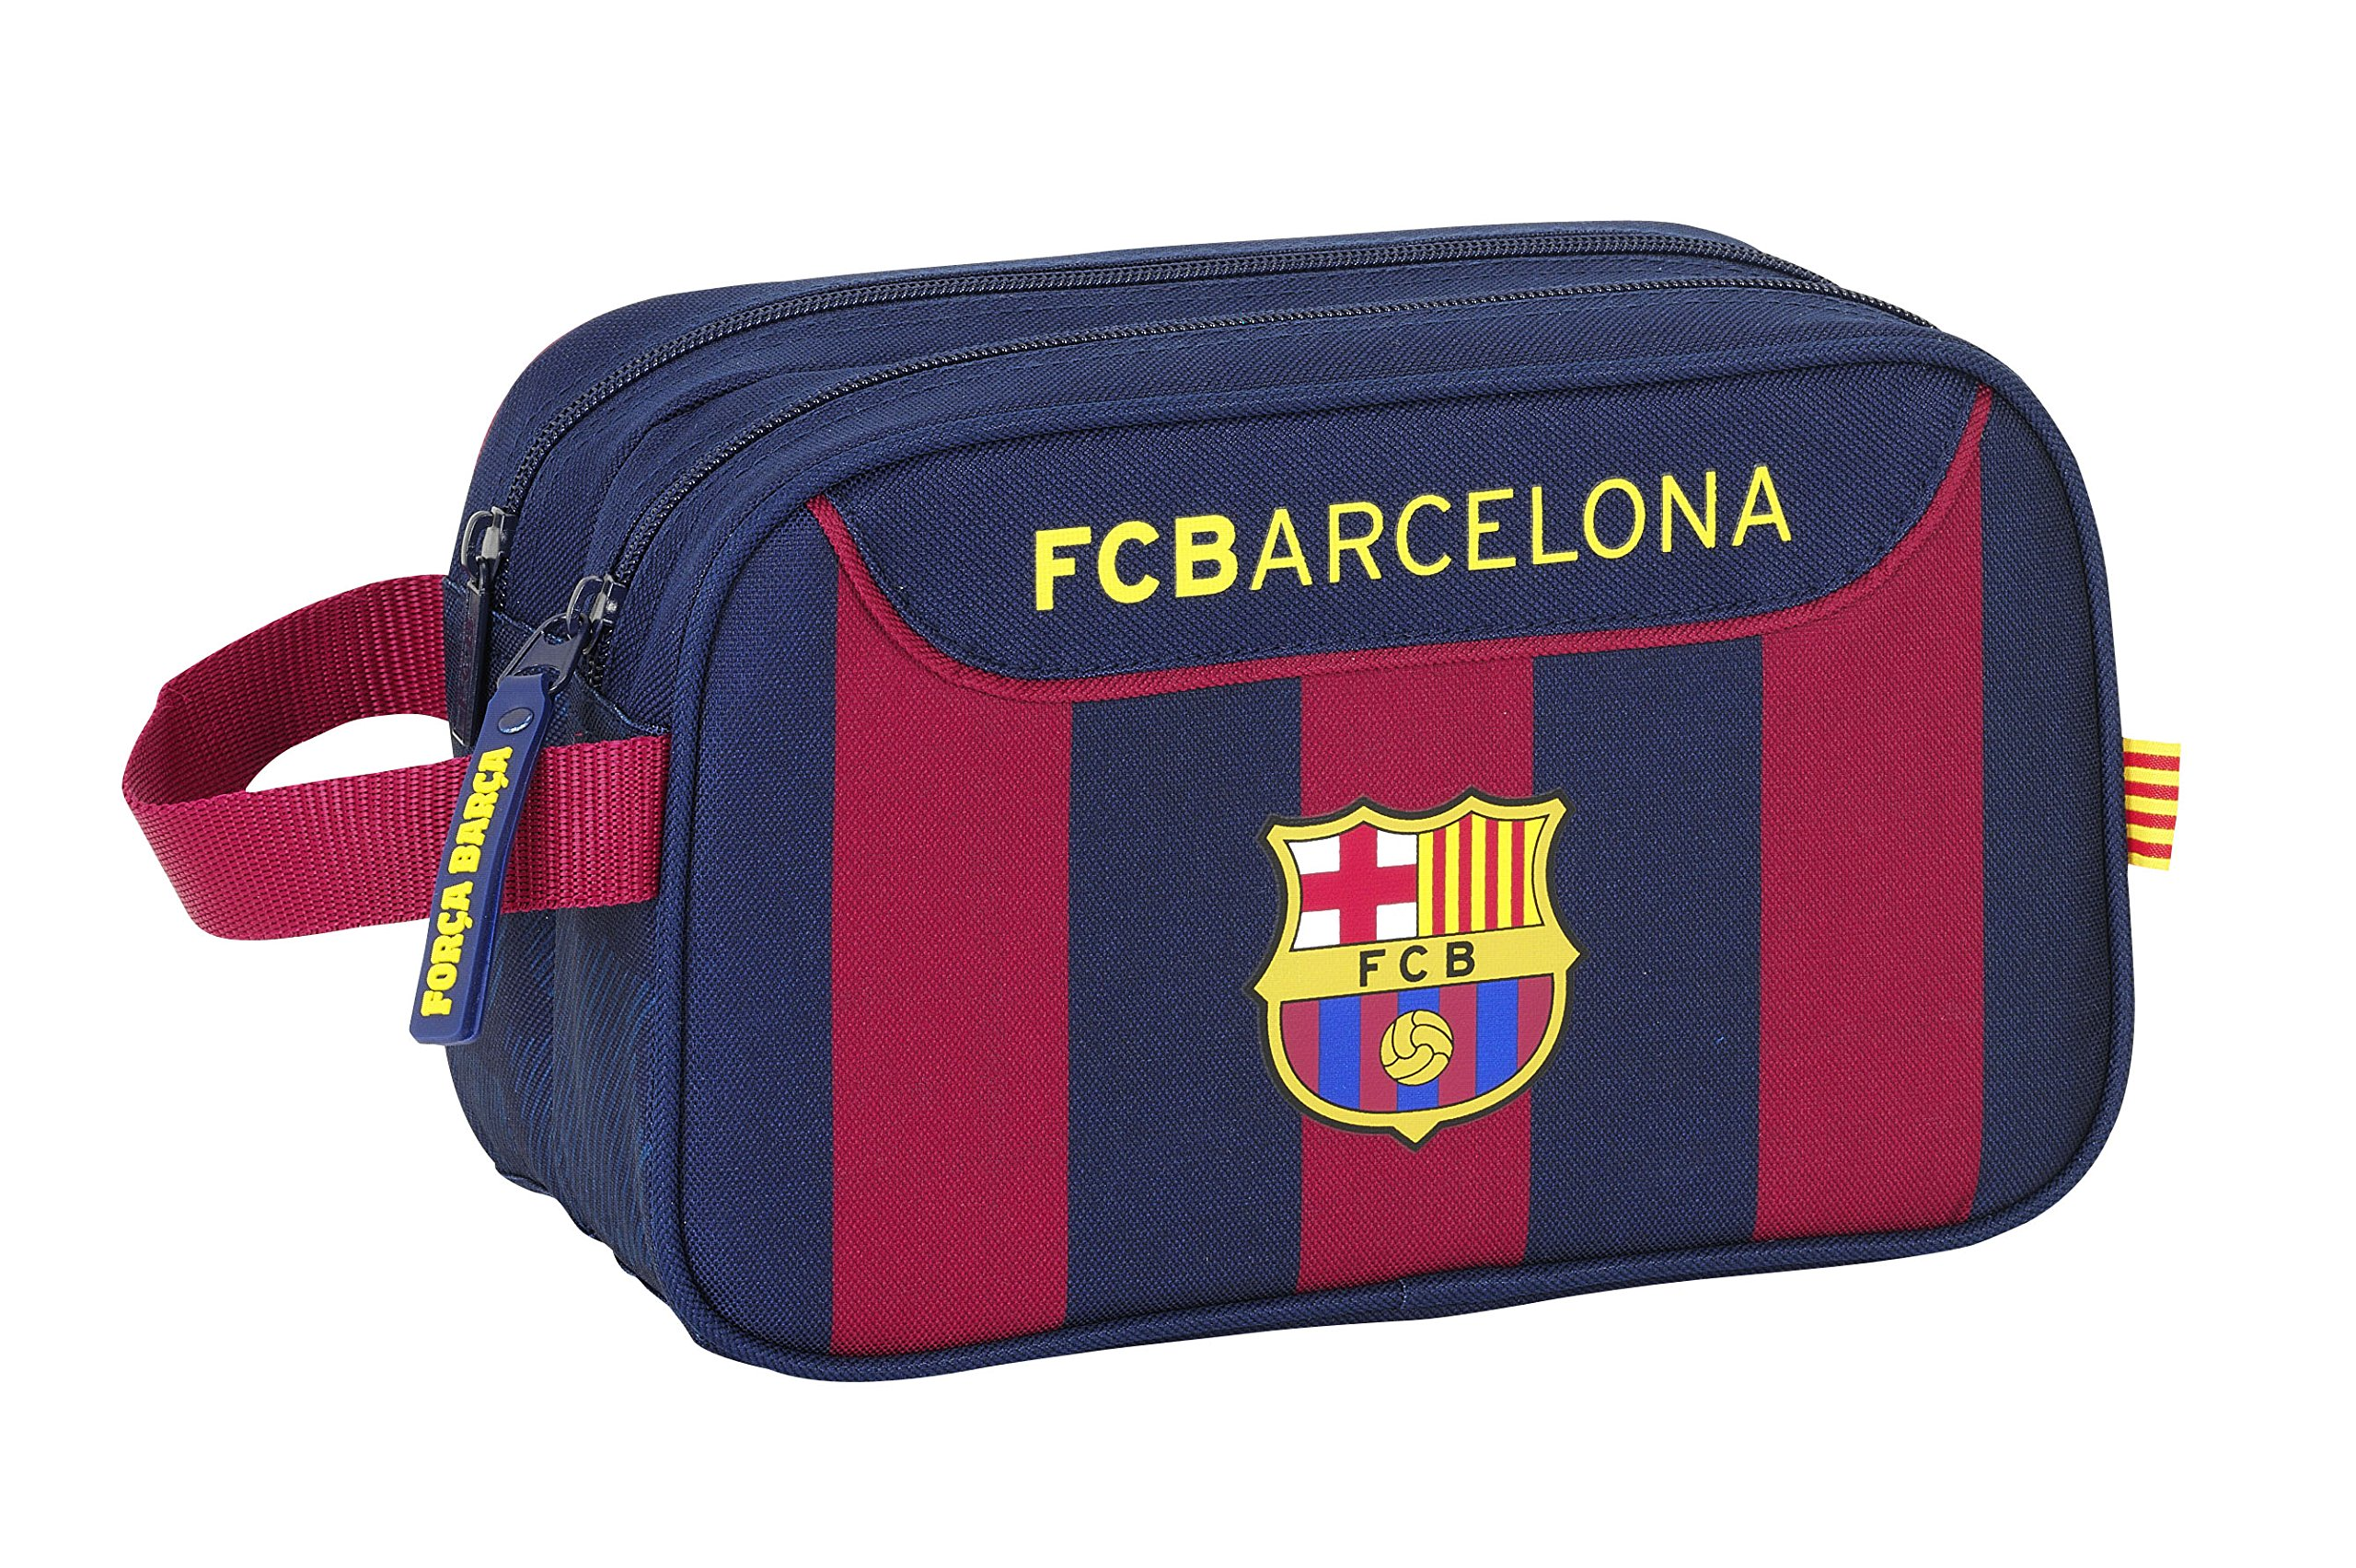 F.C. Barcelona – Neceser Adaptable, 26 x 15 x 13 cm (SAFTA 811525518)